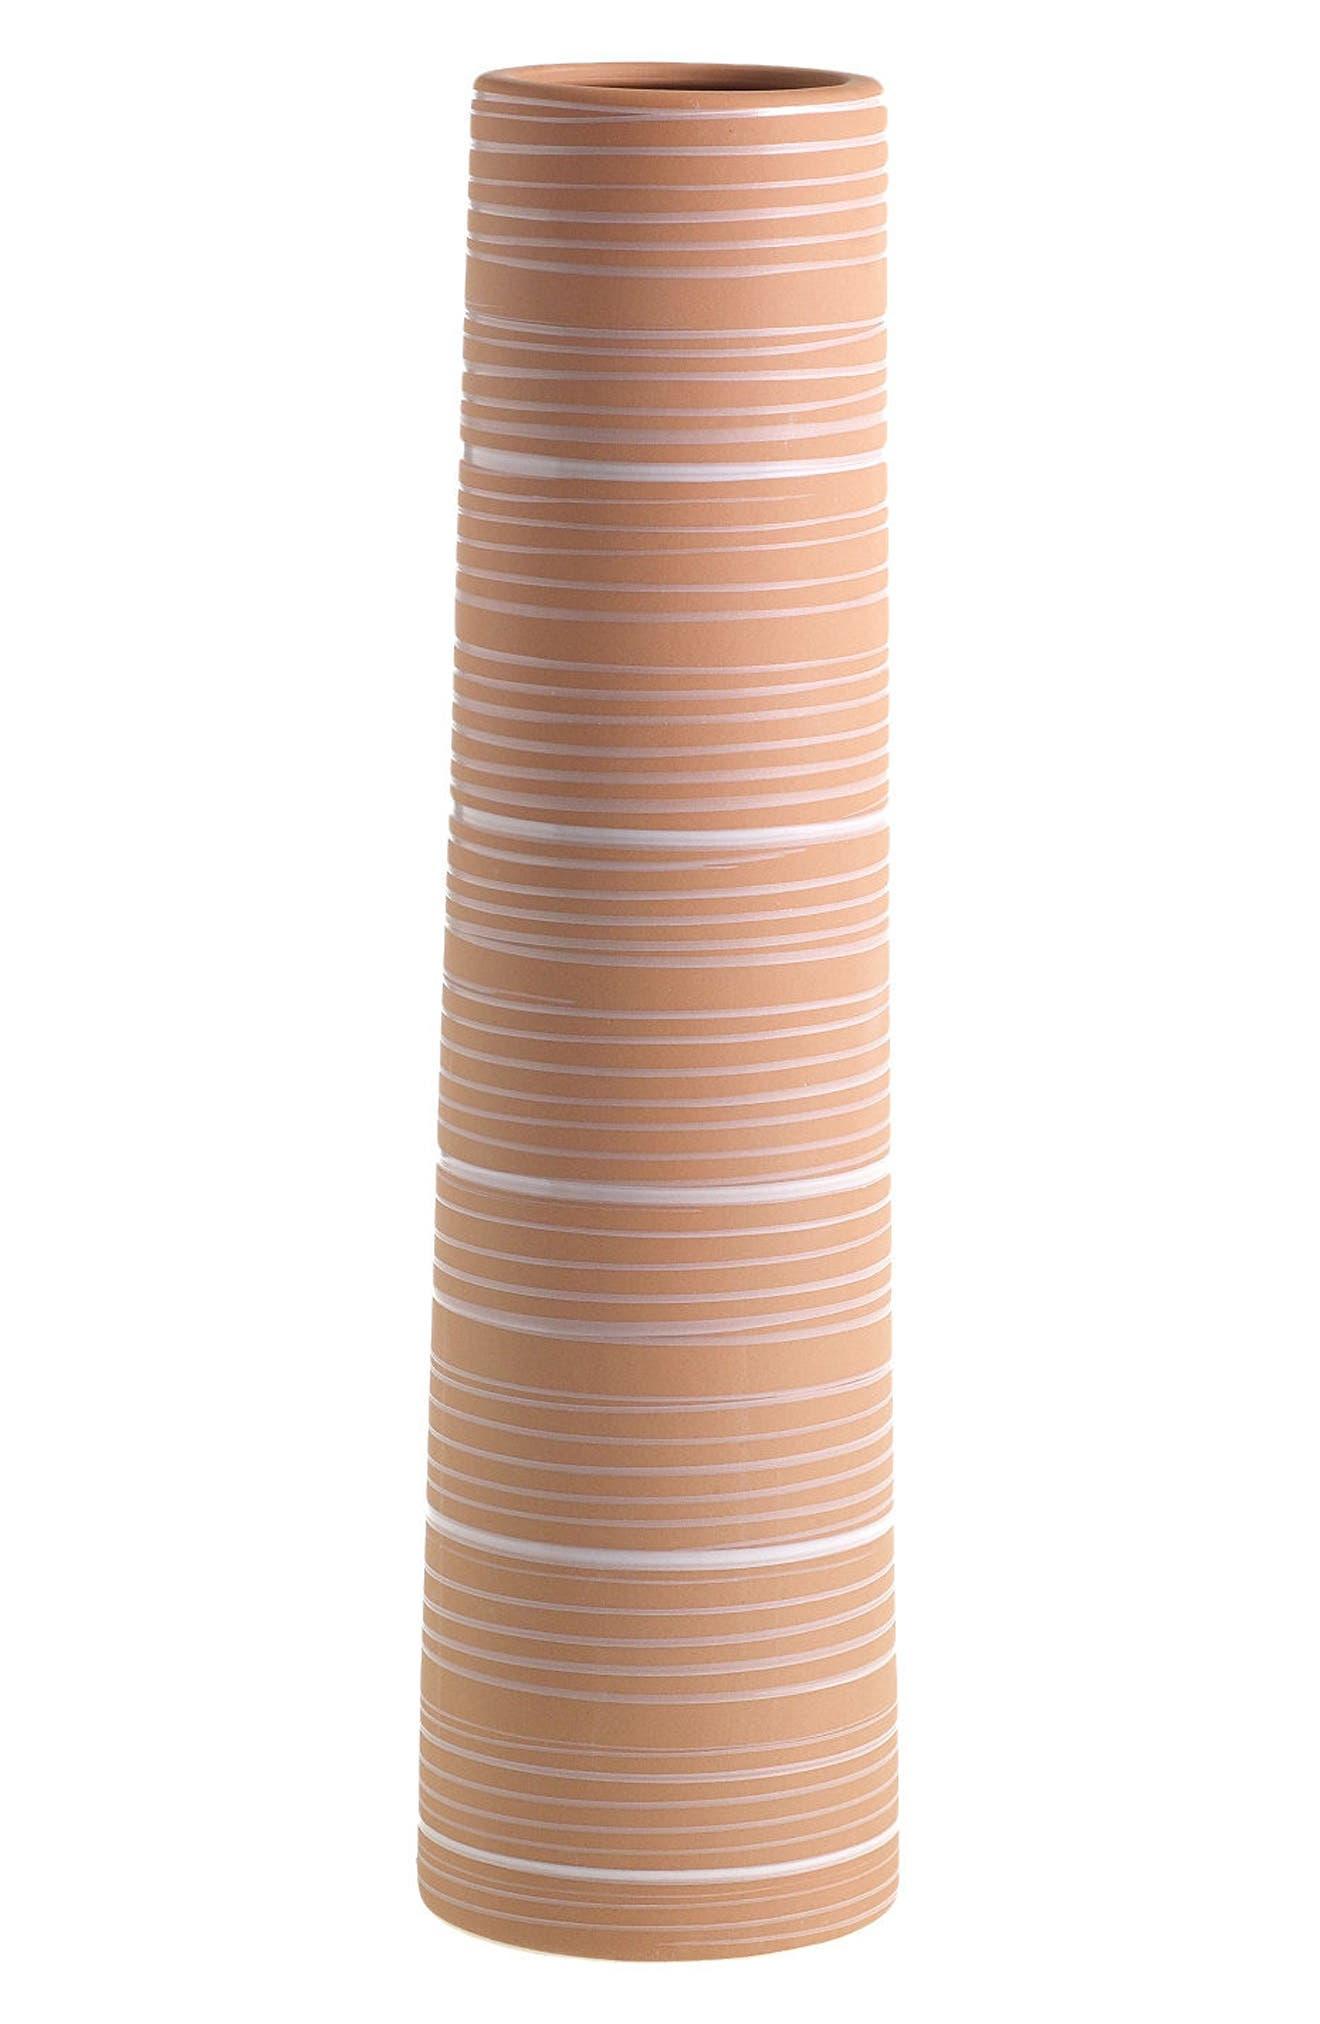 Terra Cotta Vase,                             Main thumbnail 1, color,                             Orange